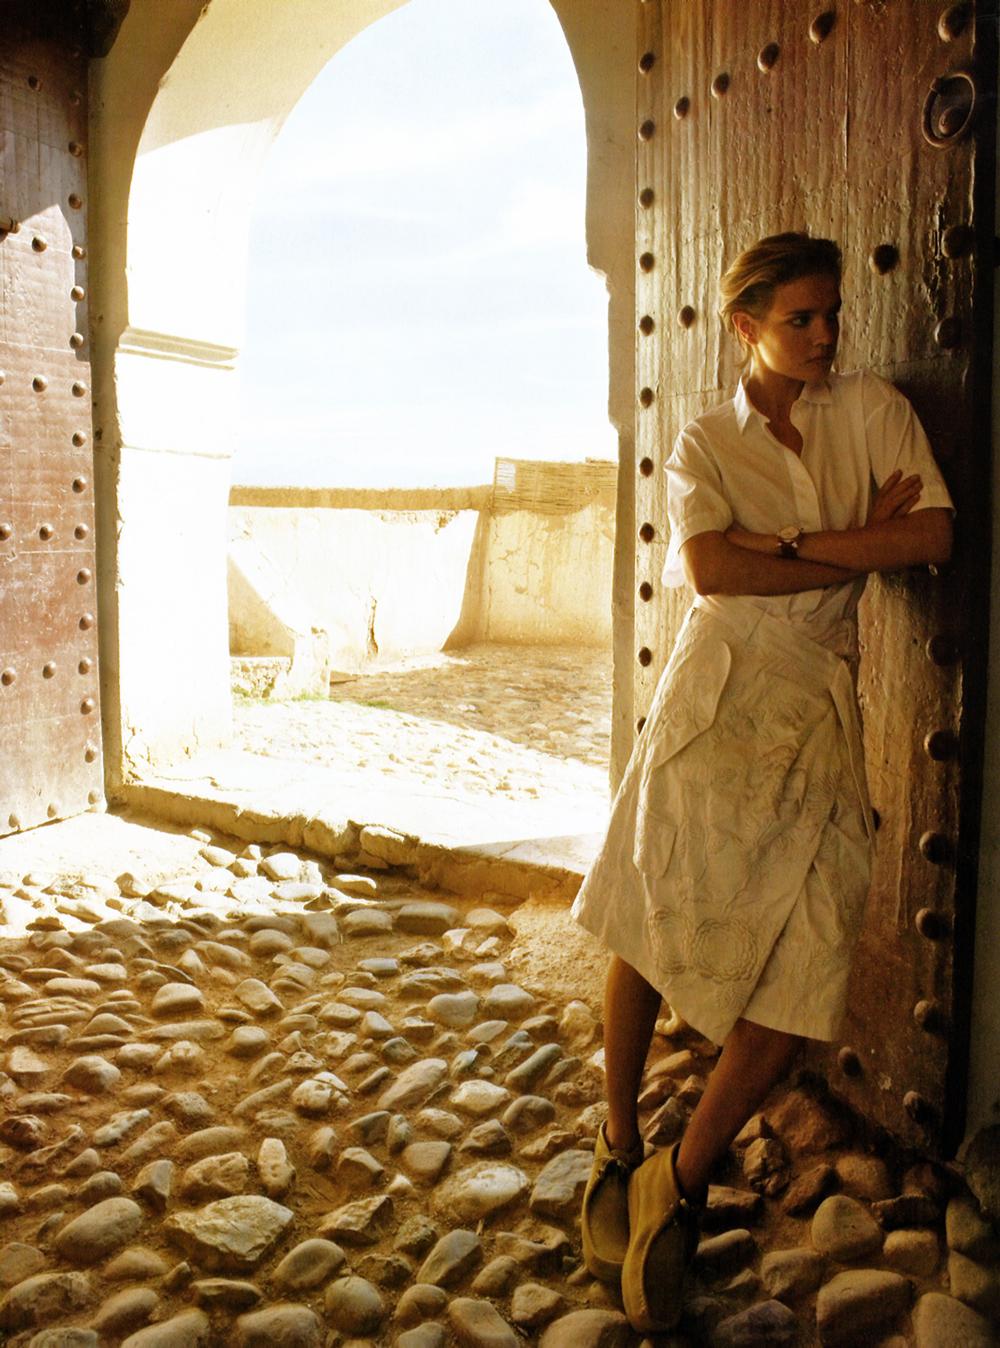 Natalia Vodianova in White Russian / Vogue US March 2007 (photography: Mario Testino, styling: Tonne Goodman)  / fashion editorials via fashioned by love / british fashion blog